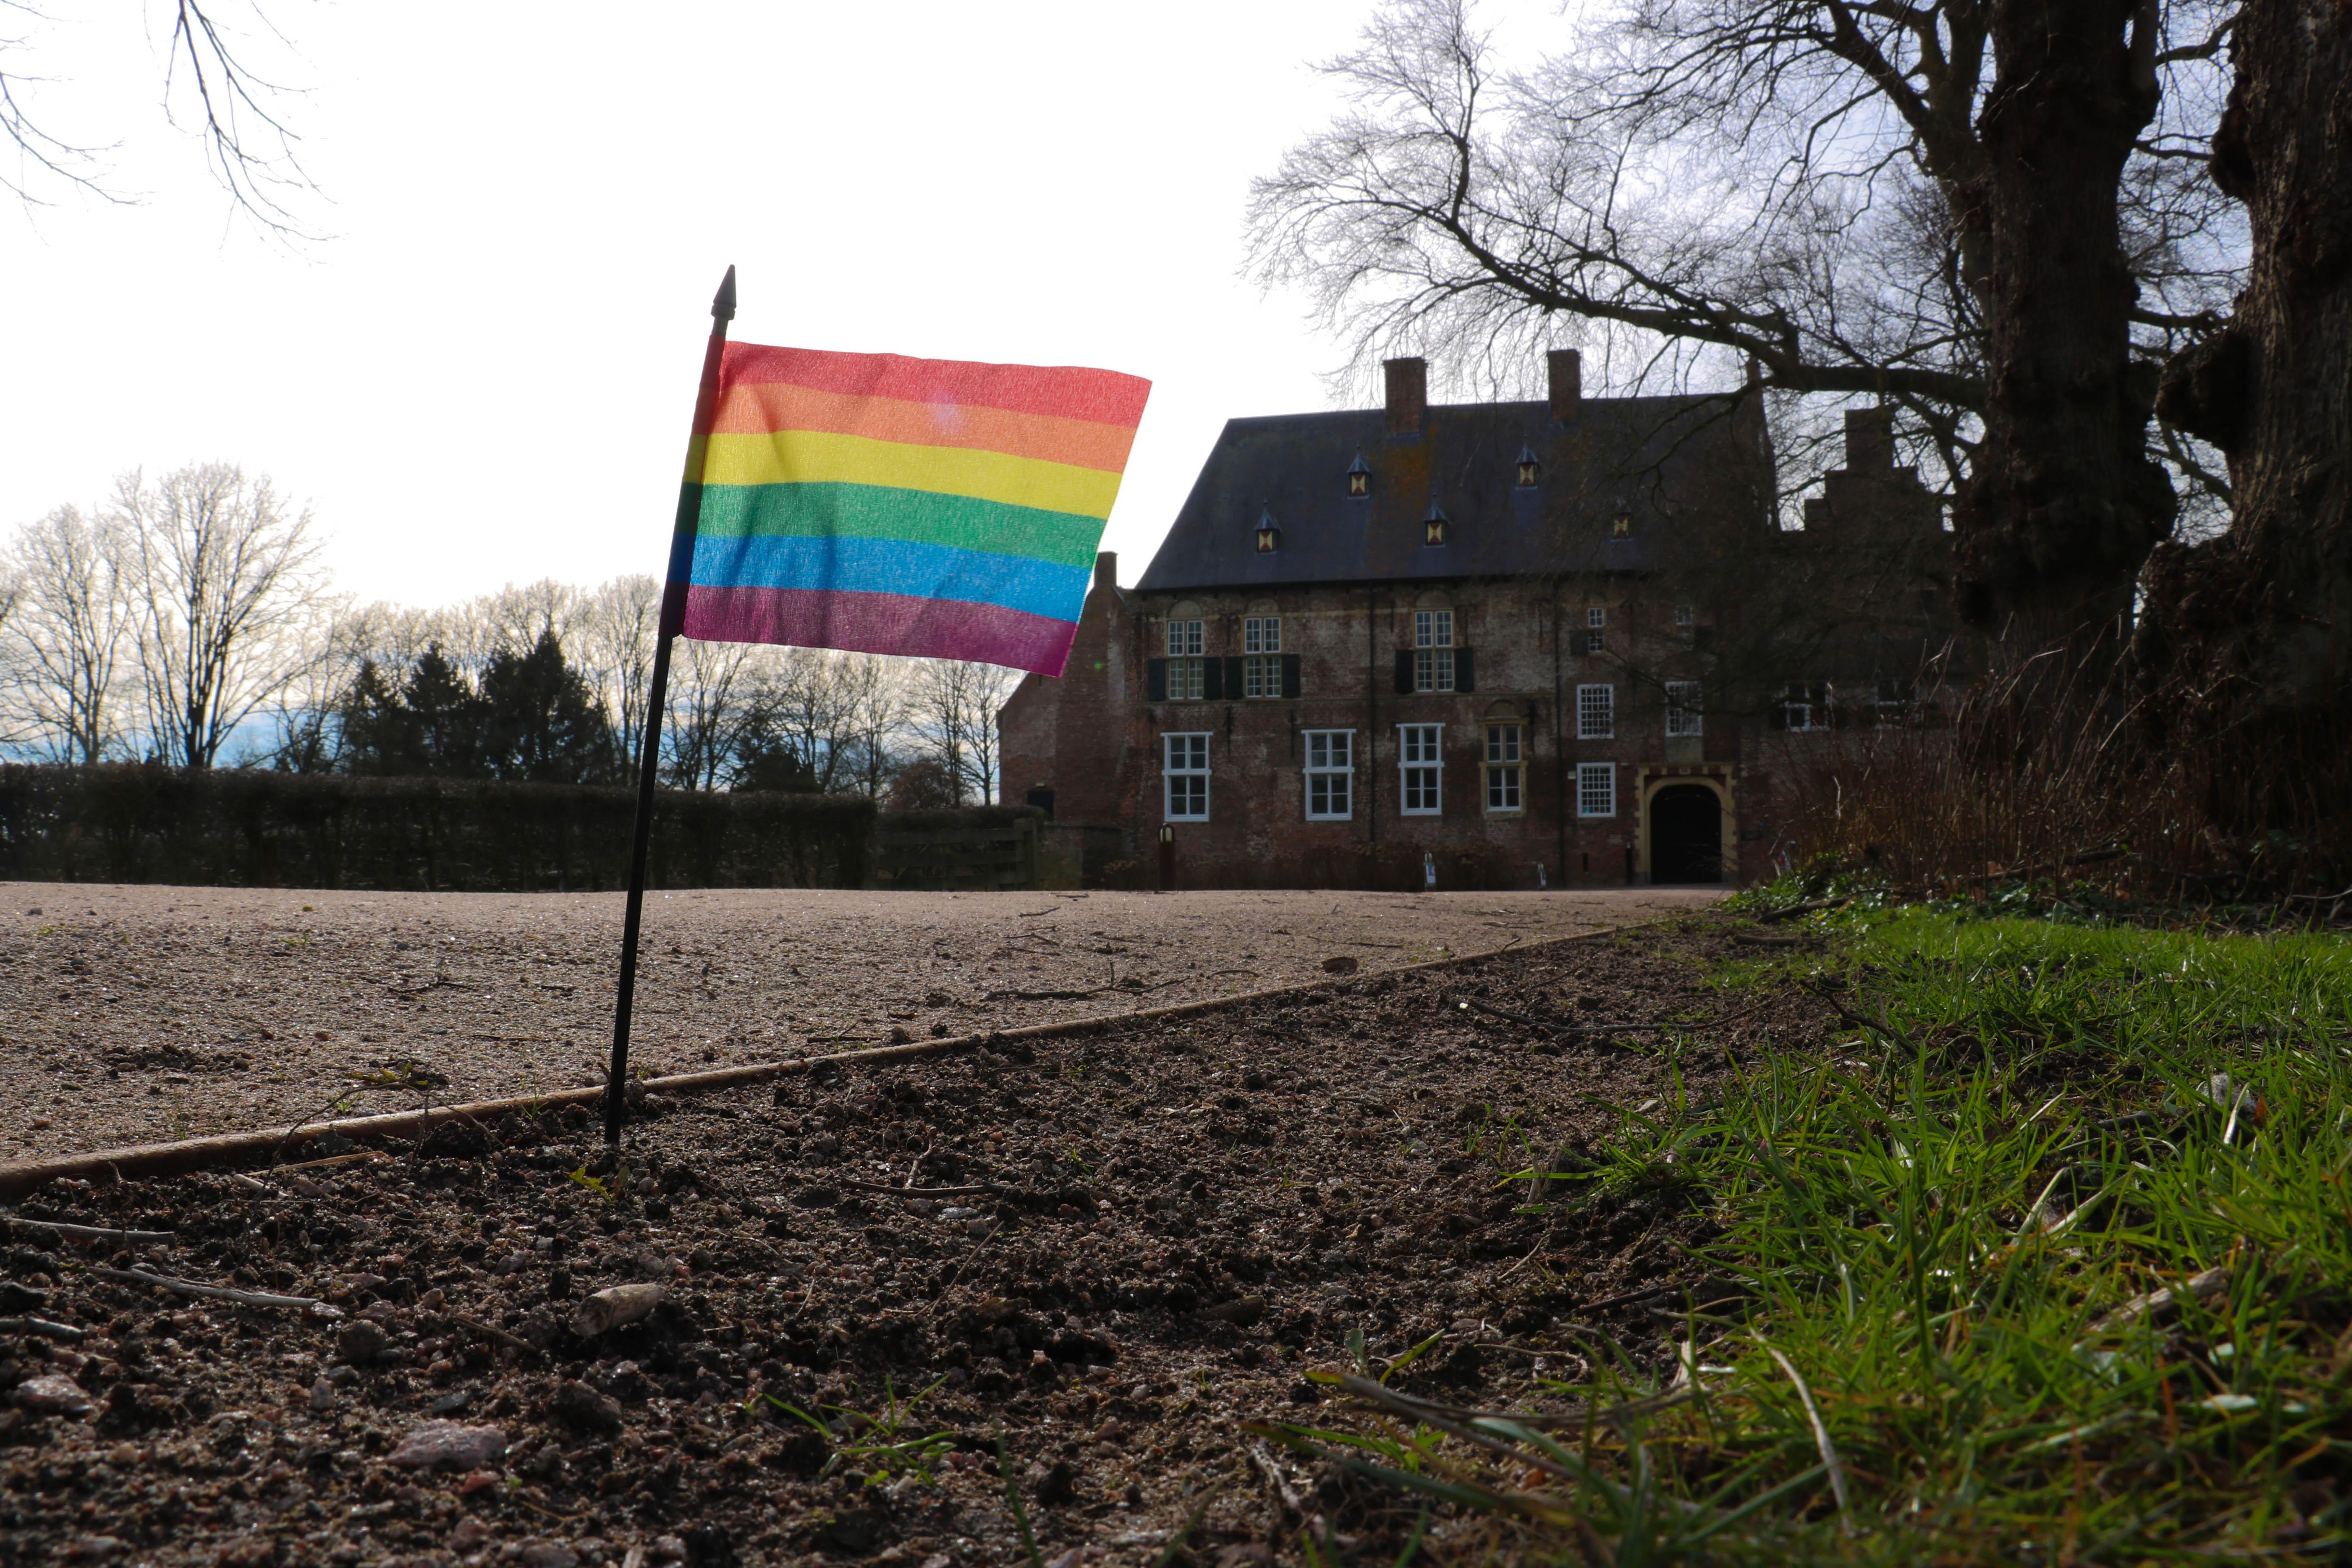 LHBTI'ers in Gelderland voelen zich vaak onveilig